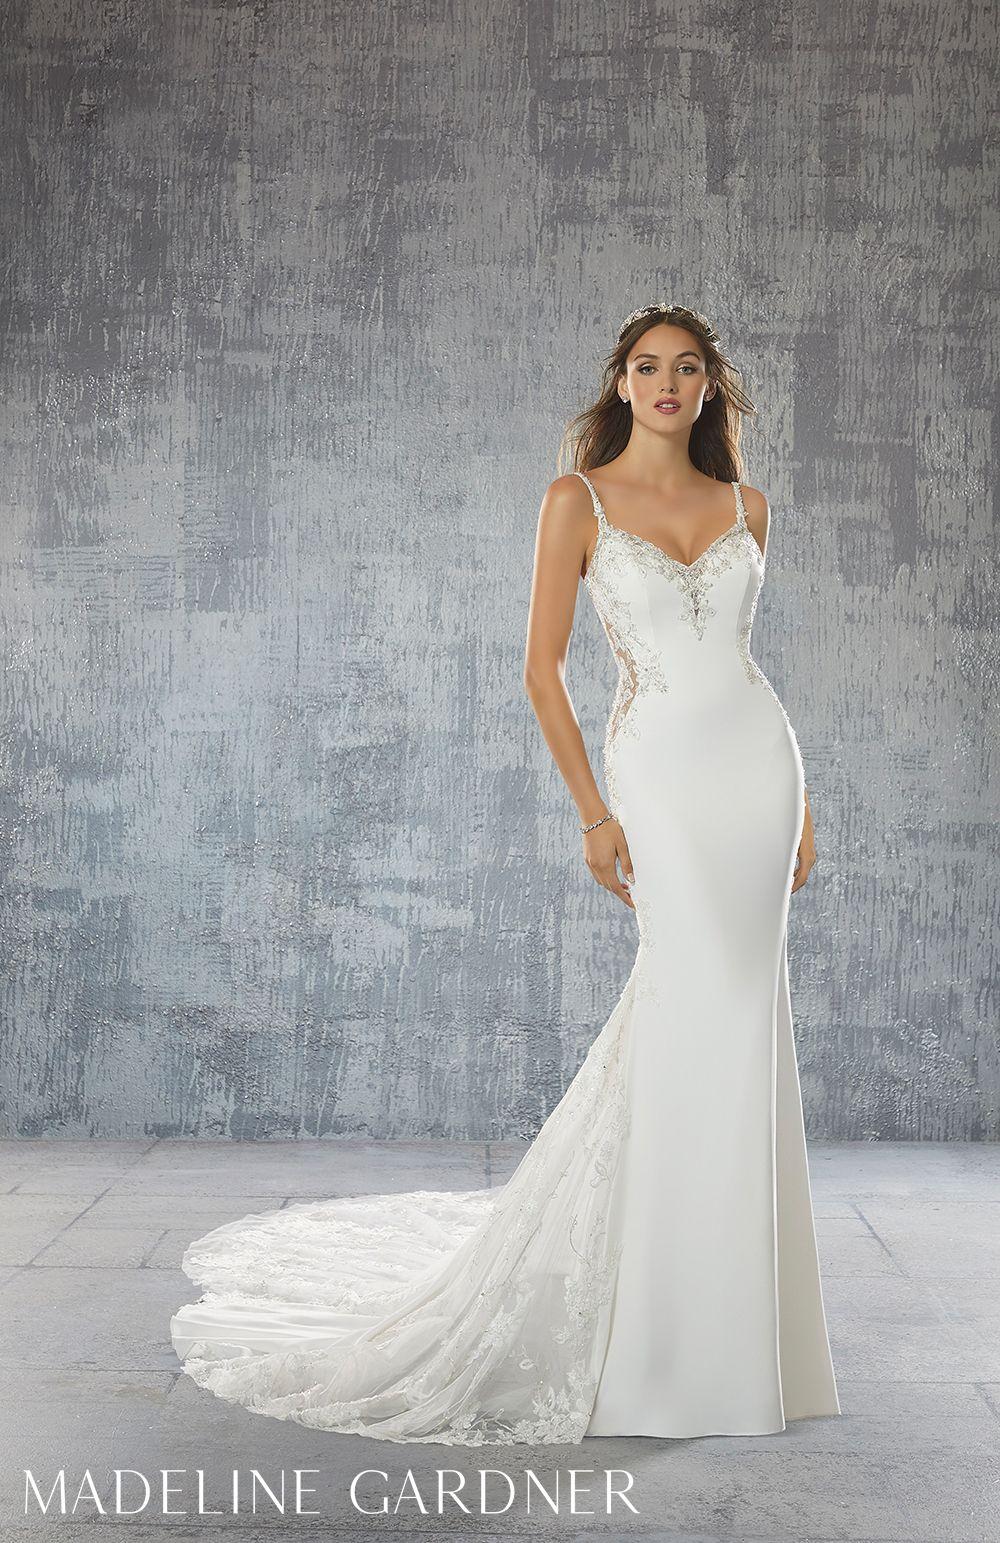 Sydney Wedding Dress Morilee Wedding Dresses Beautiful Wedding Gowns Gown Wedding Dress